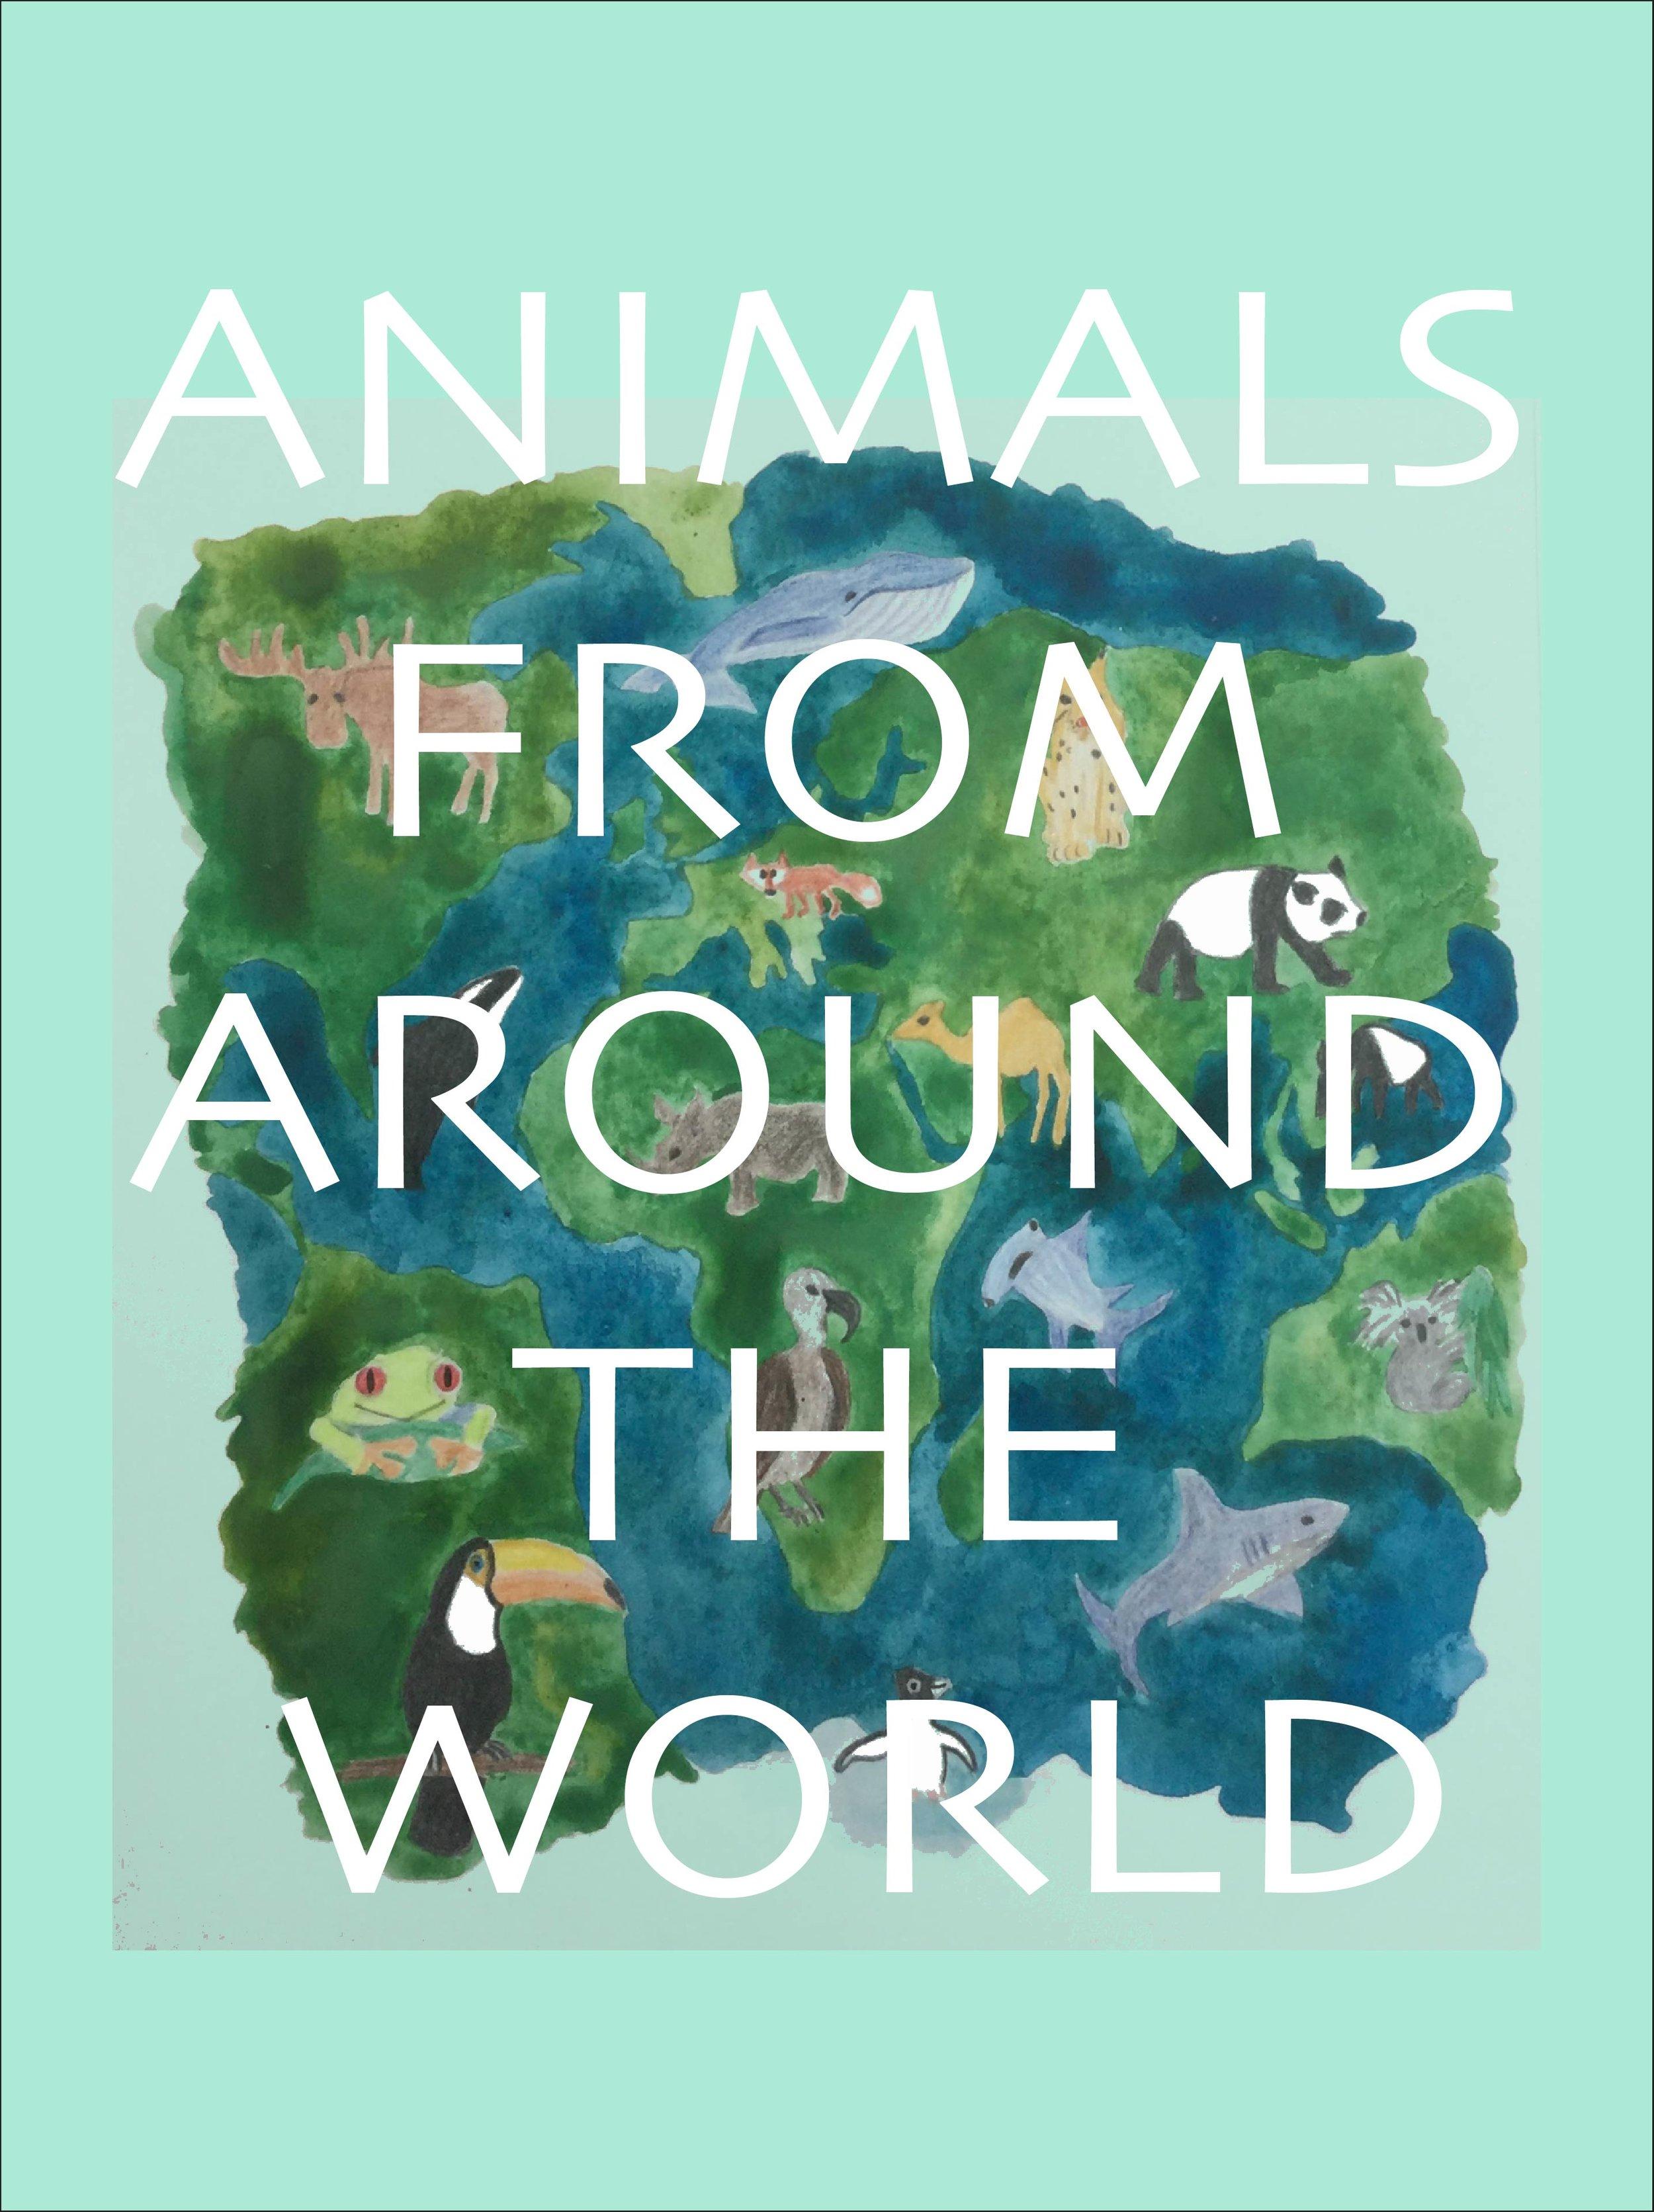 ANIMAL COVER 2A-01.jpg